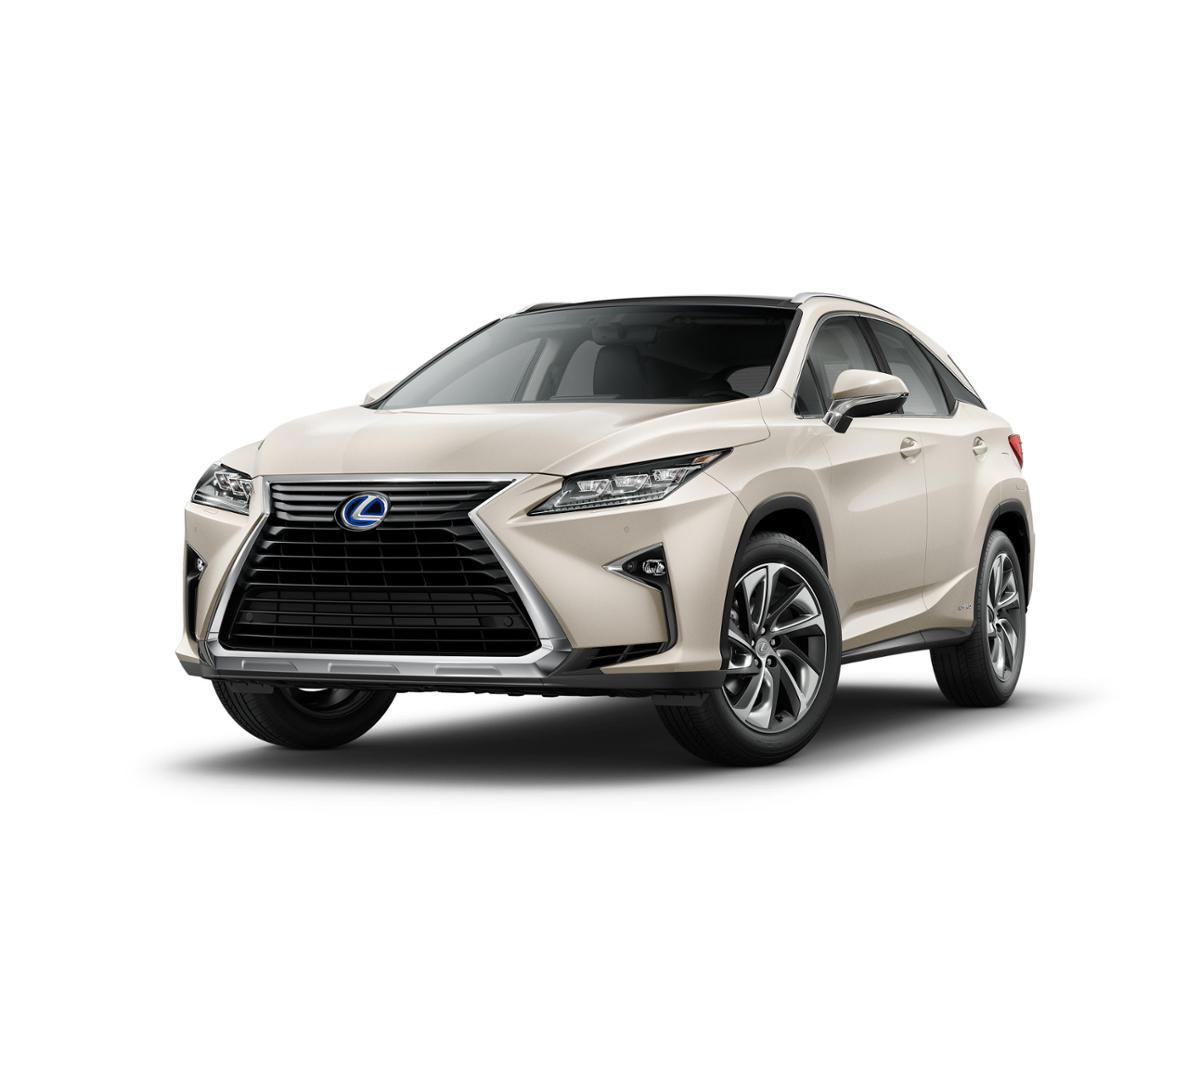 new rx whippany lexus in vehicle dealers models photo vehicledetails nj